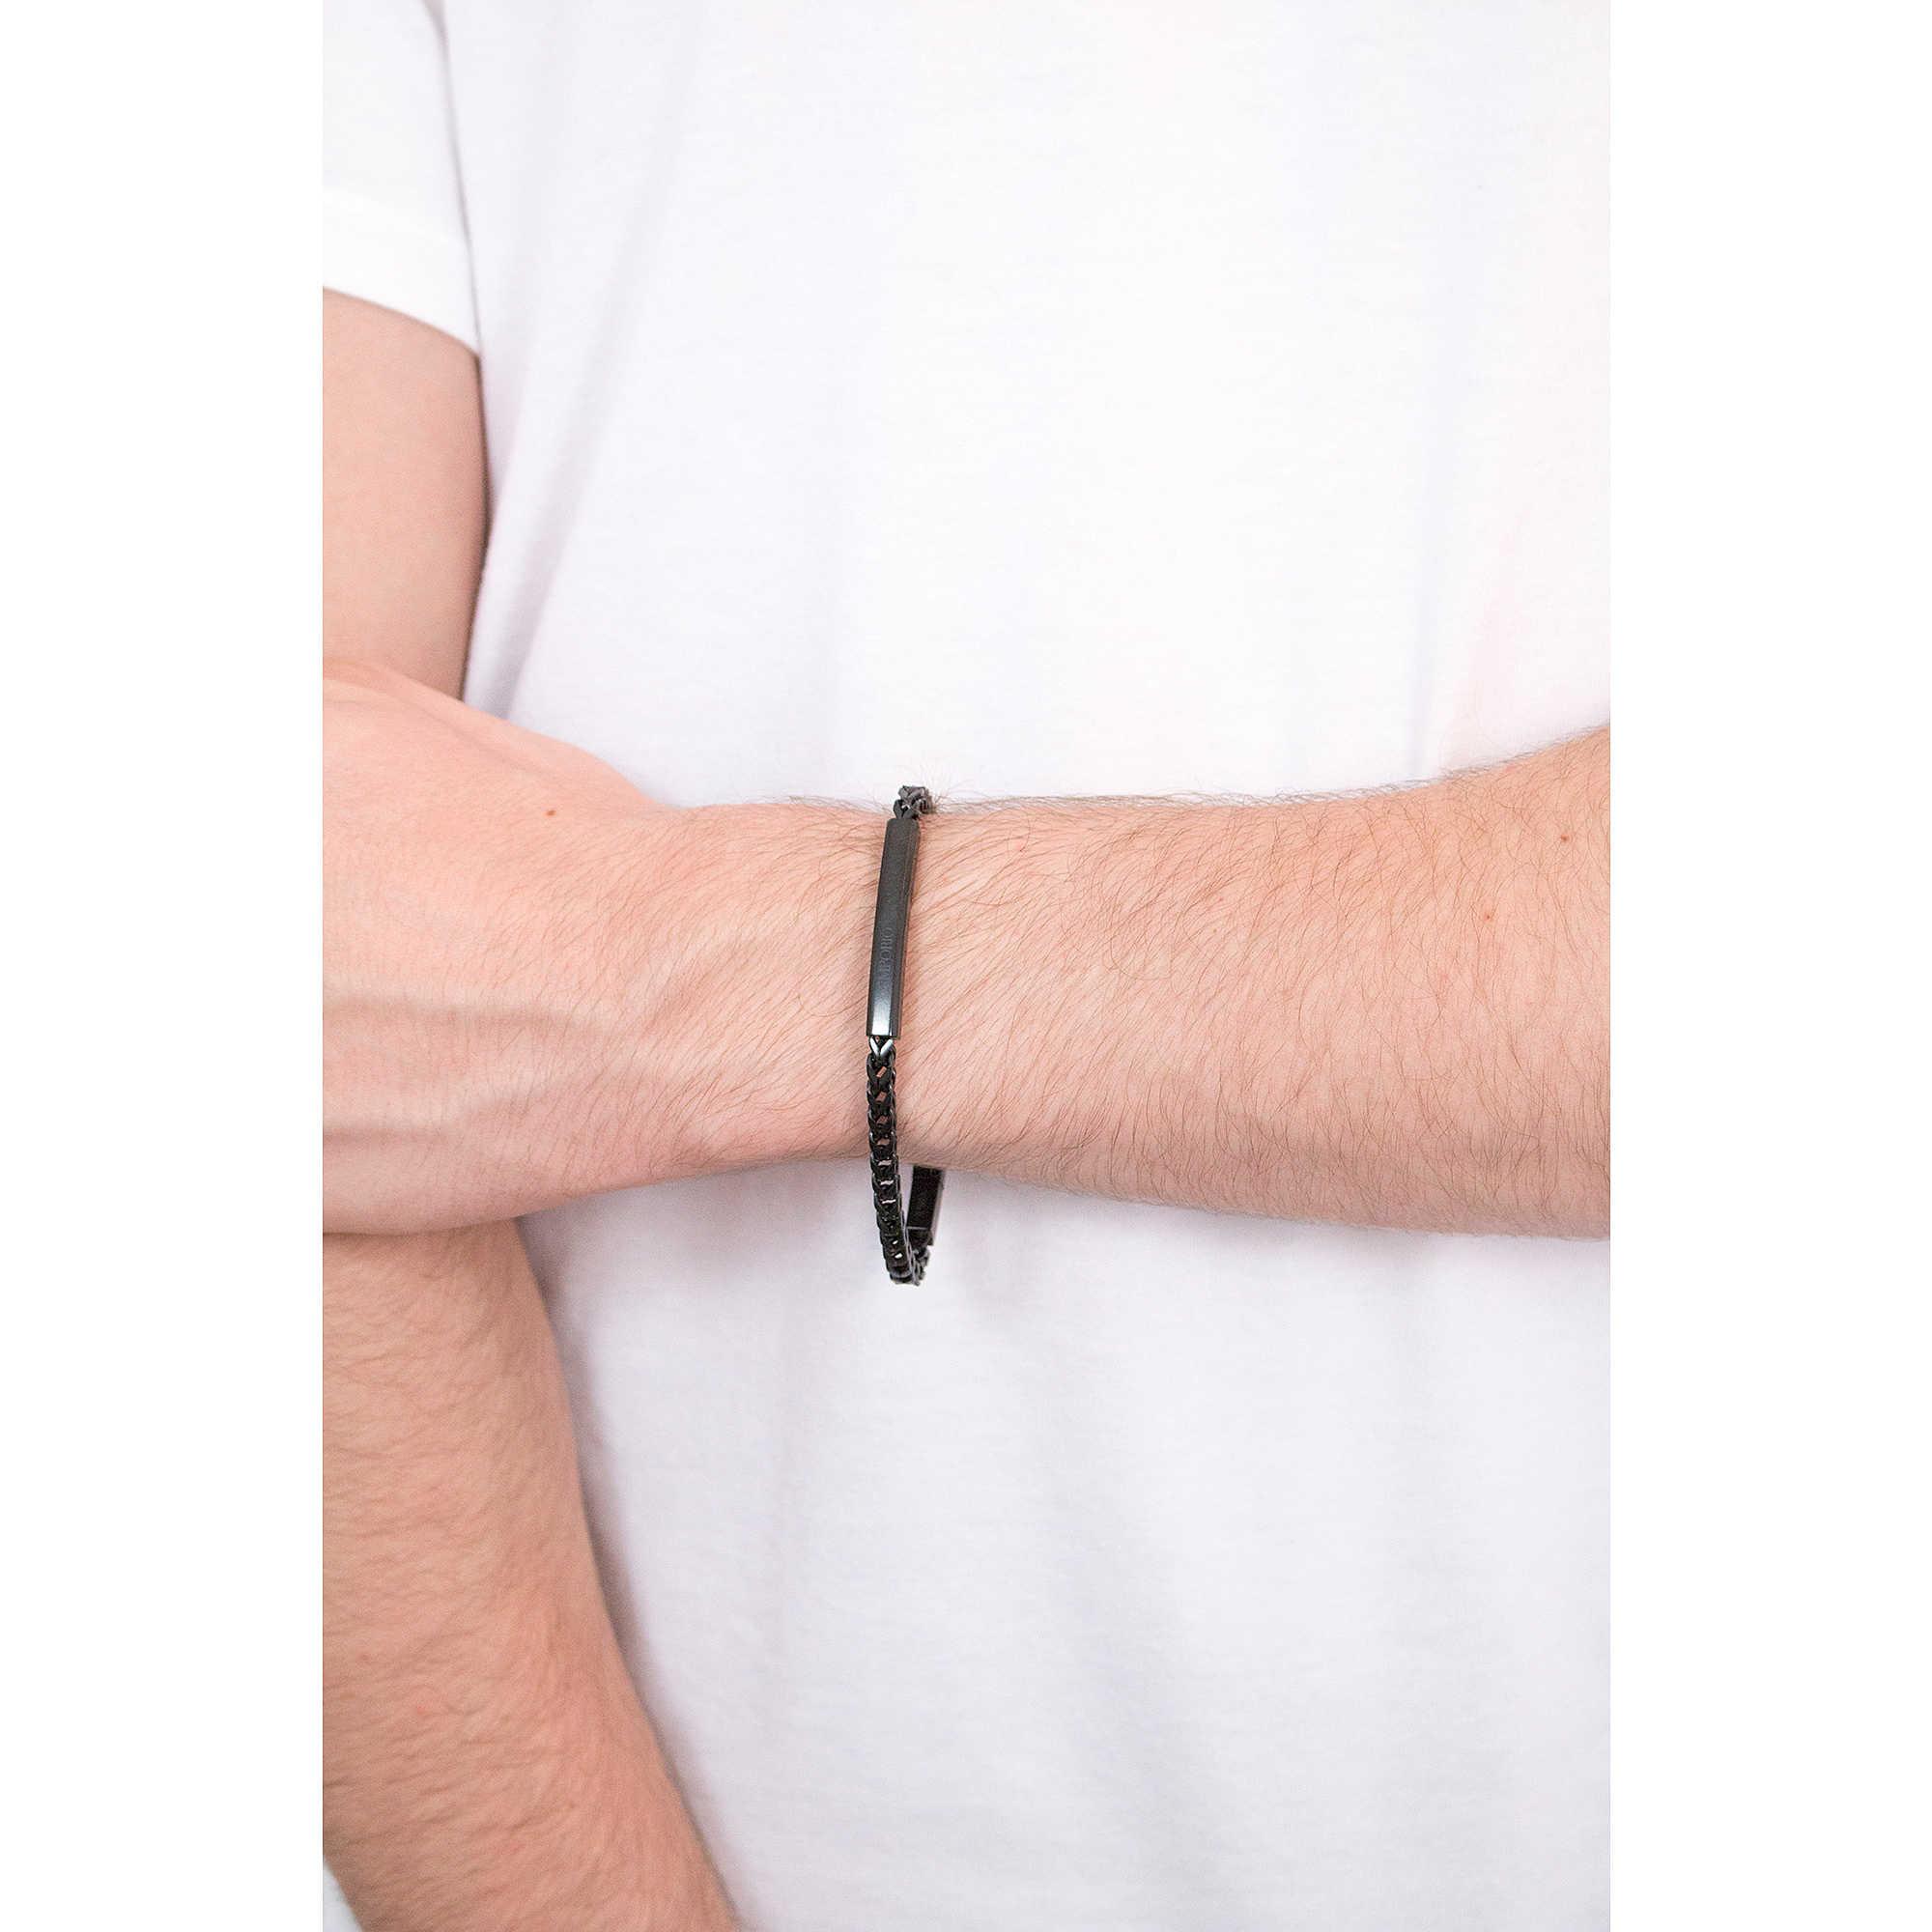 zoom. package bracelets Emporio Armani EGS2415001. zoom. bracelet man  jewellery Emporio Armani EGS2415001 18696f7776f